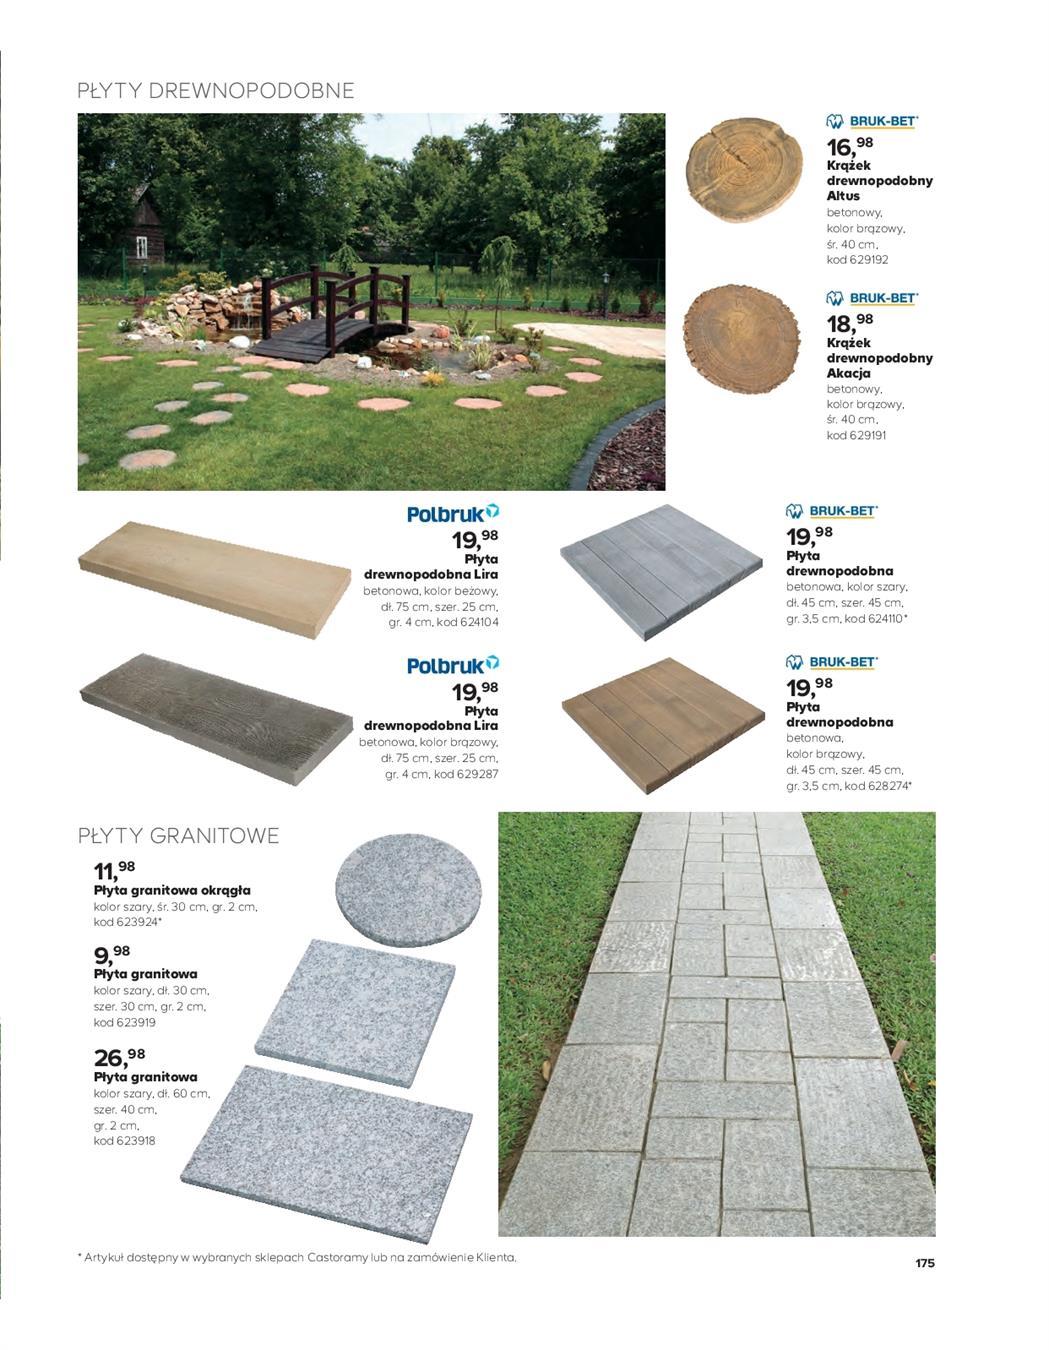 Gazetka Promocyjna Castoramapl Castorama Katalog